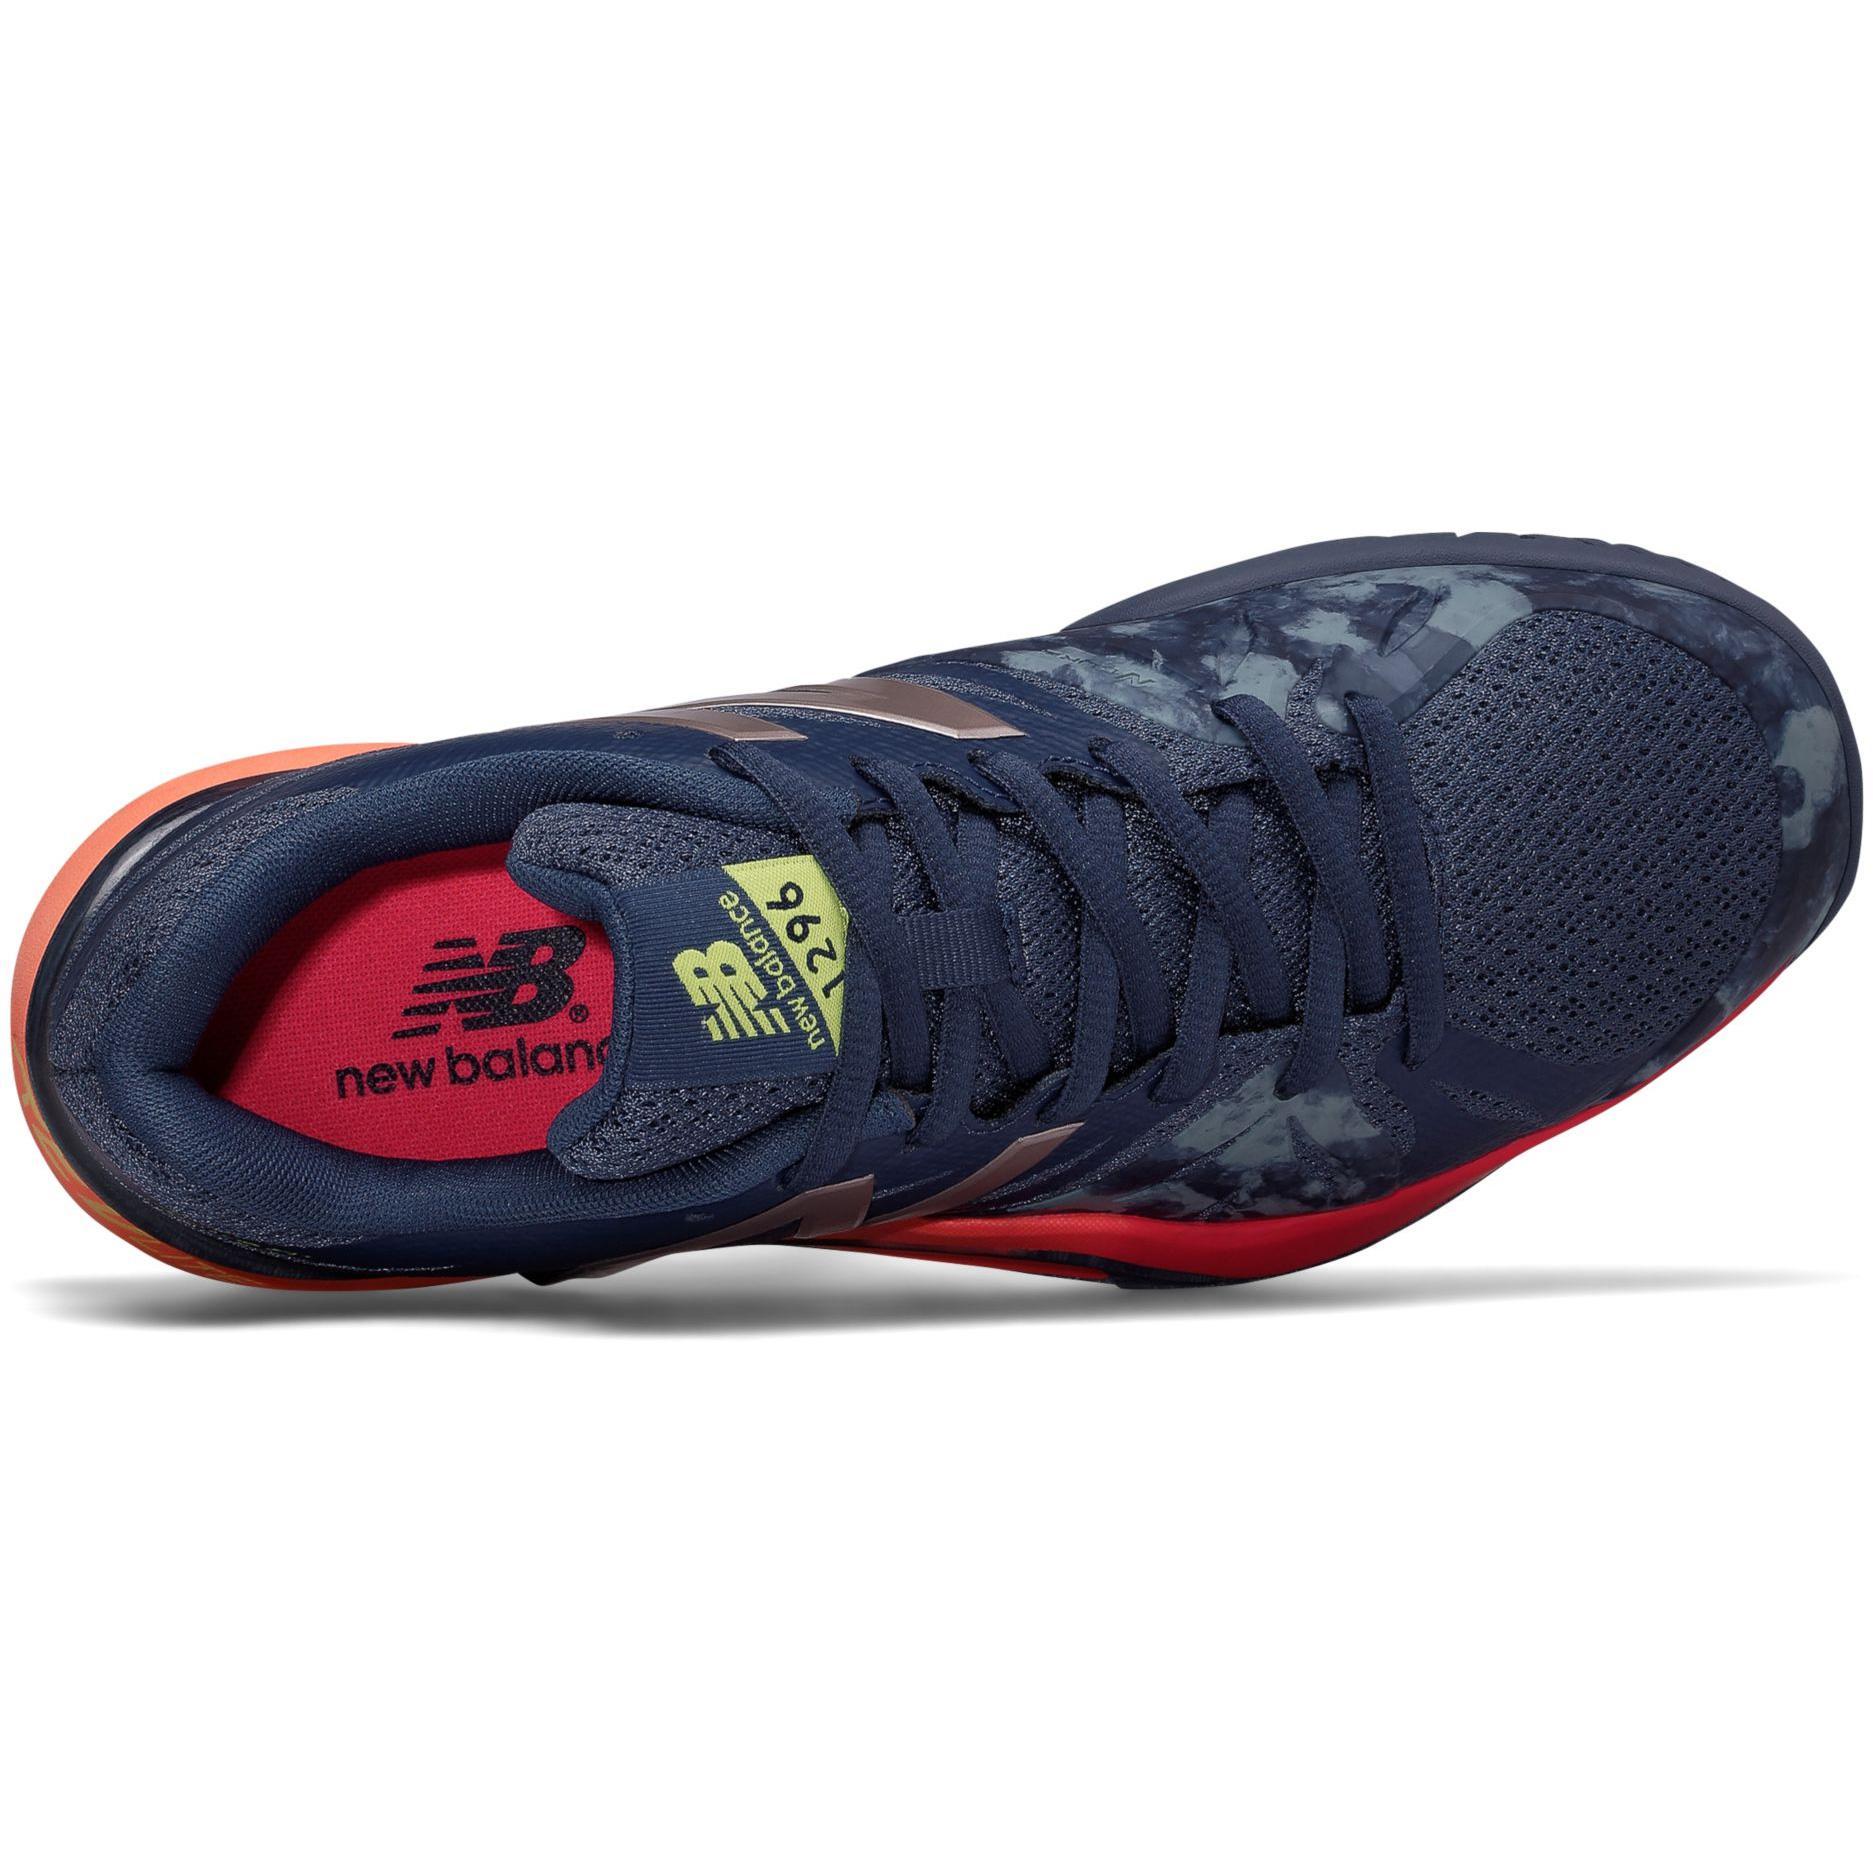 4f94894fc3c20 New Balance Womens 1296v2 Tennis Shoes - Indigo/Pink (B ...